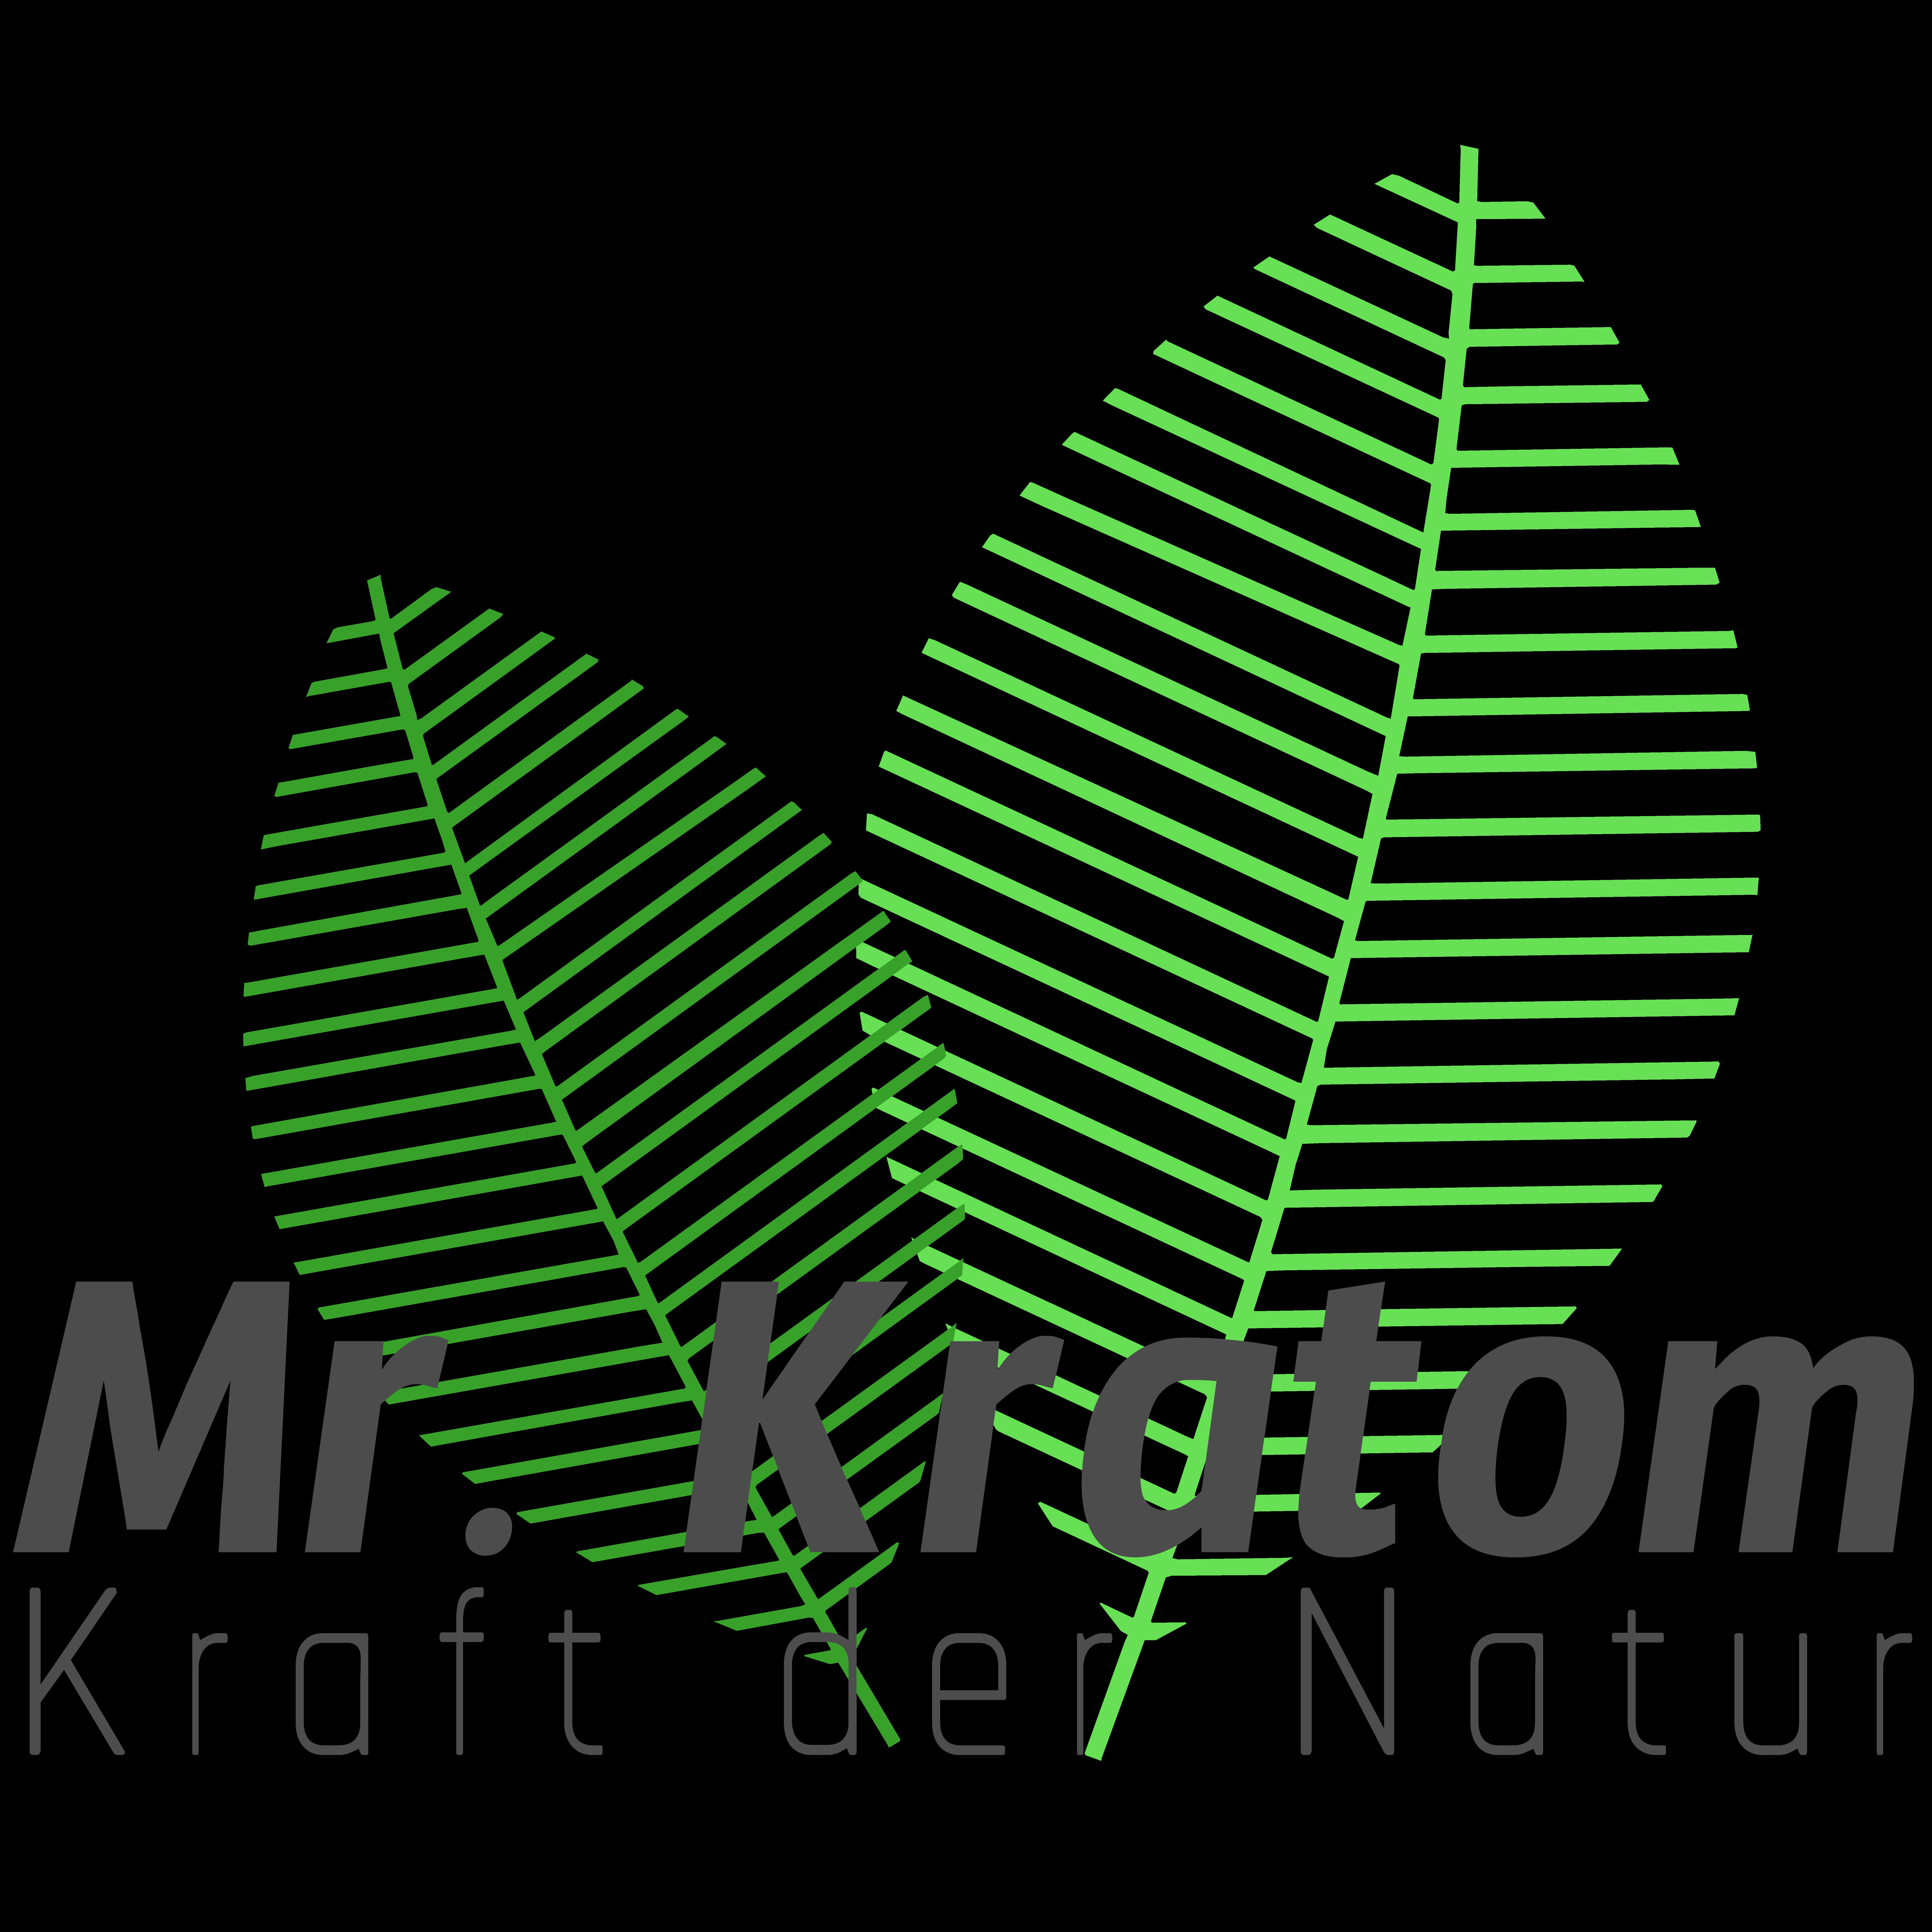 Mr. Kratom